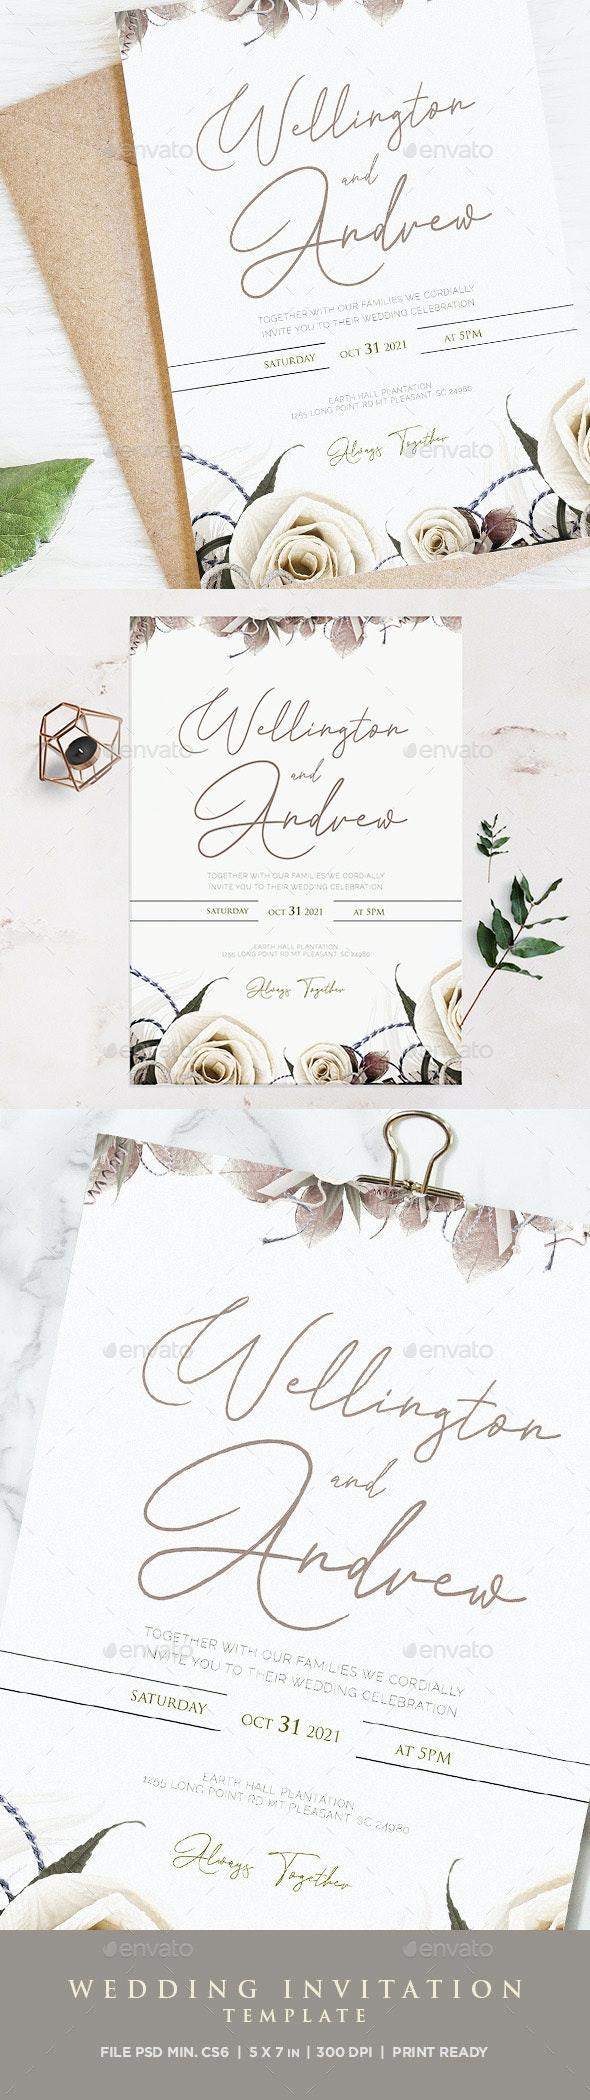 Professional Wedding Invitation Template - Weddings Cards & Invites